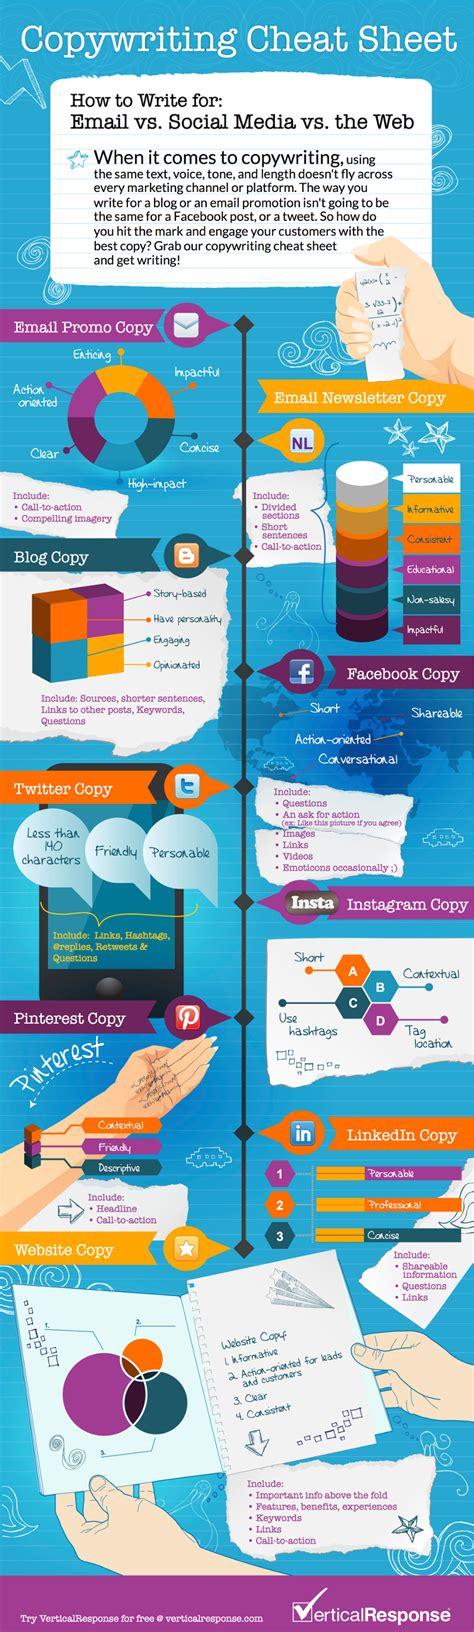 8 great web copywriting tips brandongaille